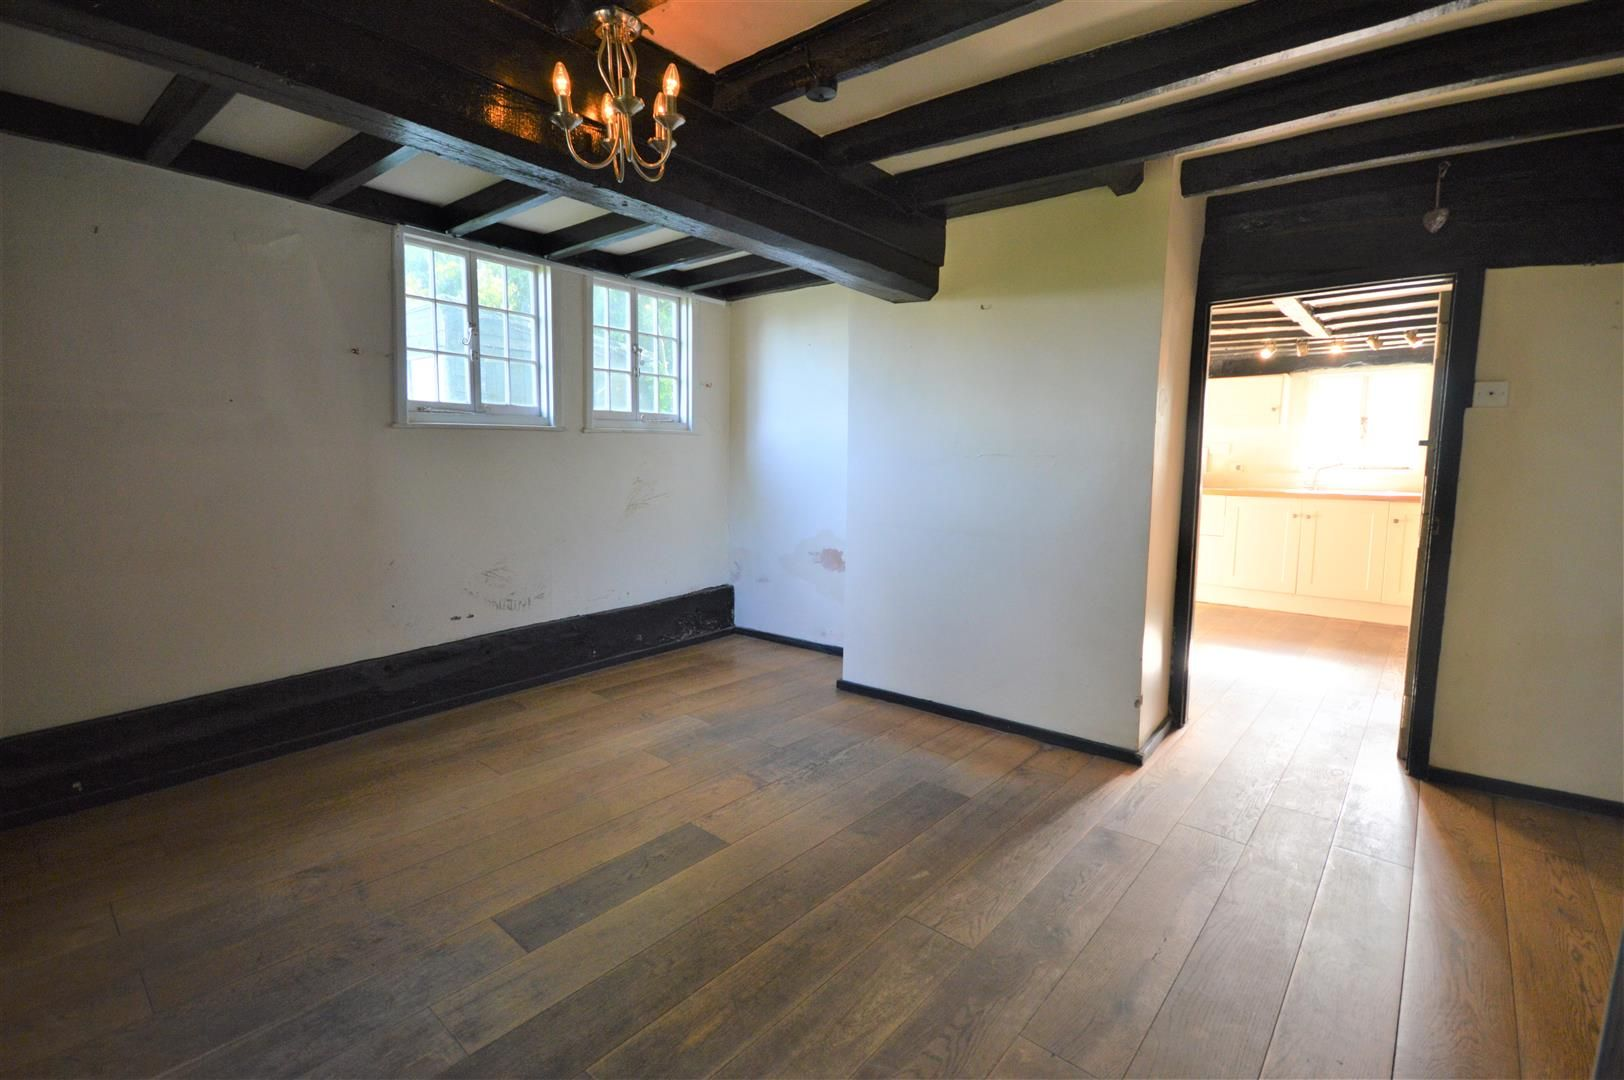 3 bed cottage for sale in Pembridge 3